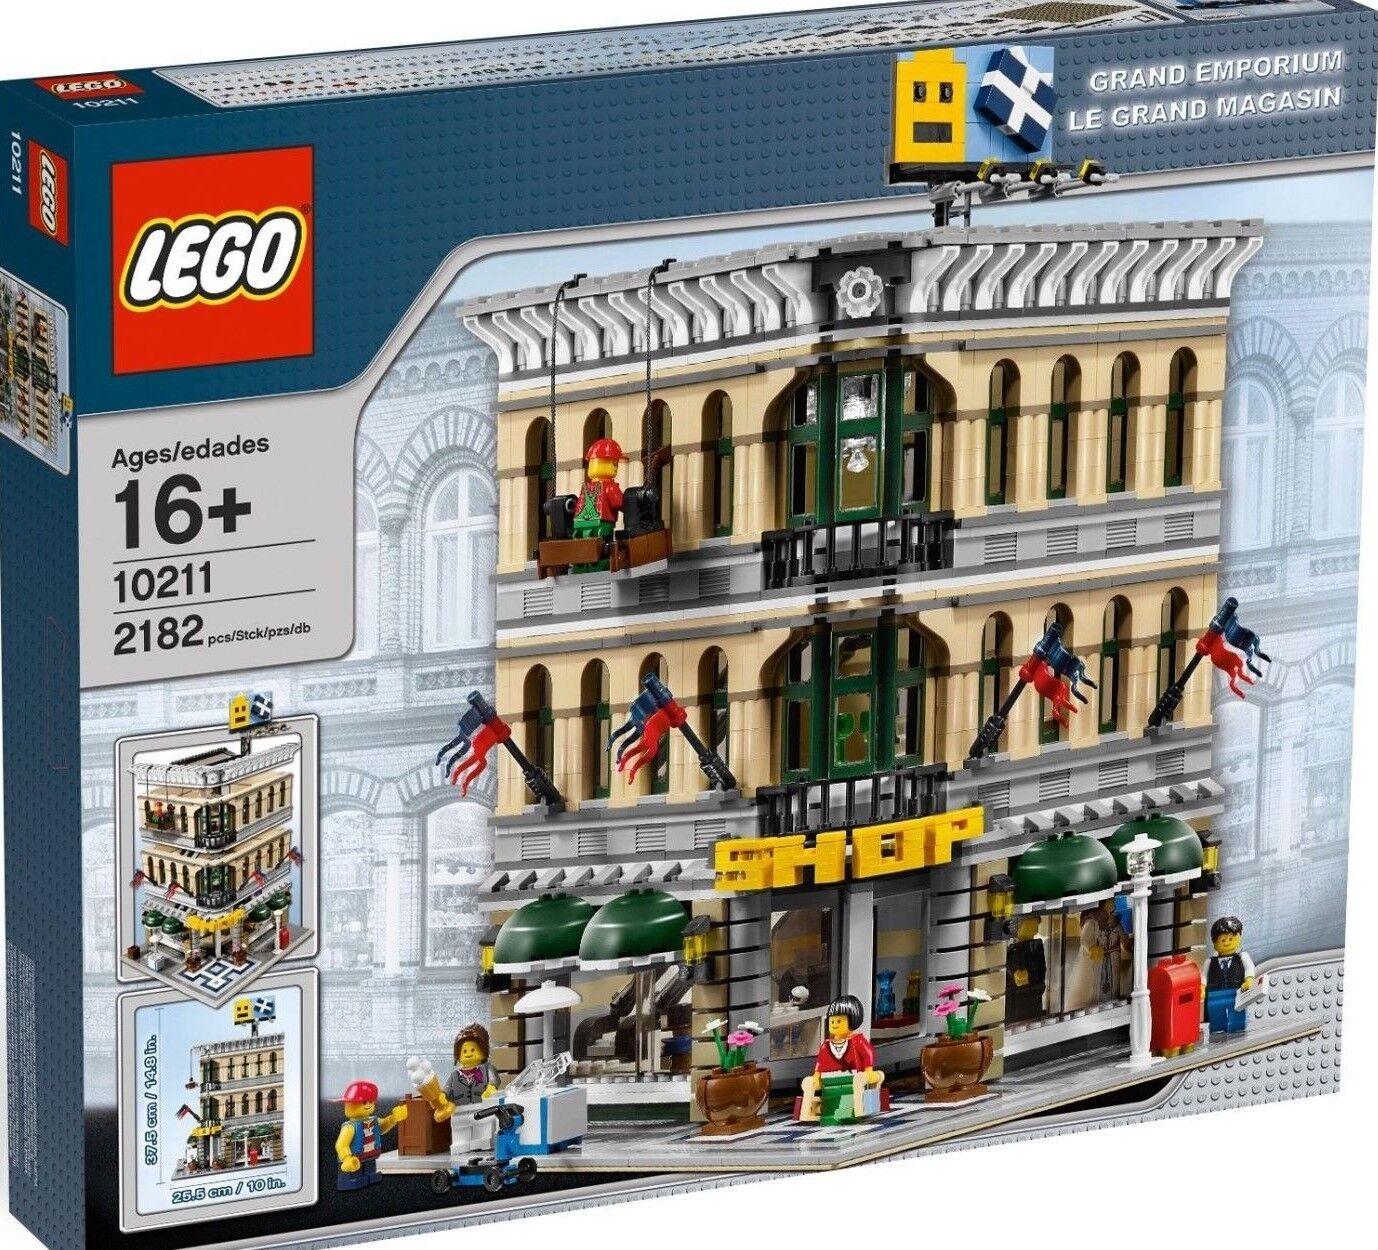 Lego ® Creator Modular 10211 grand DepartHommest Store  nouveau & OVP Series 10224 10228 10211  chaud